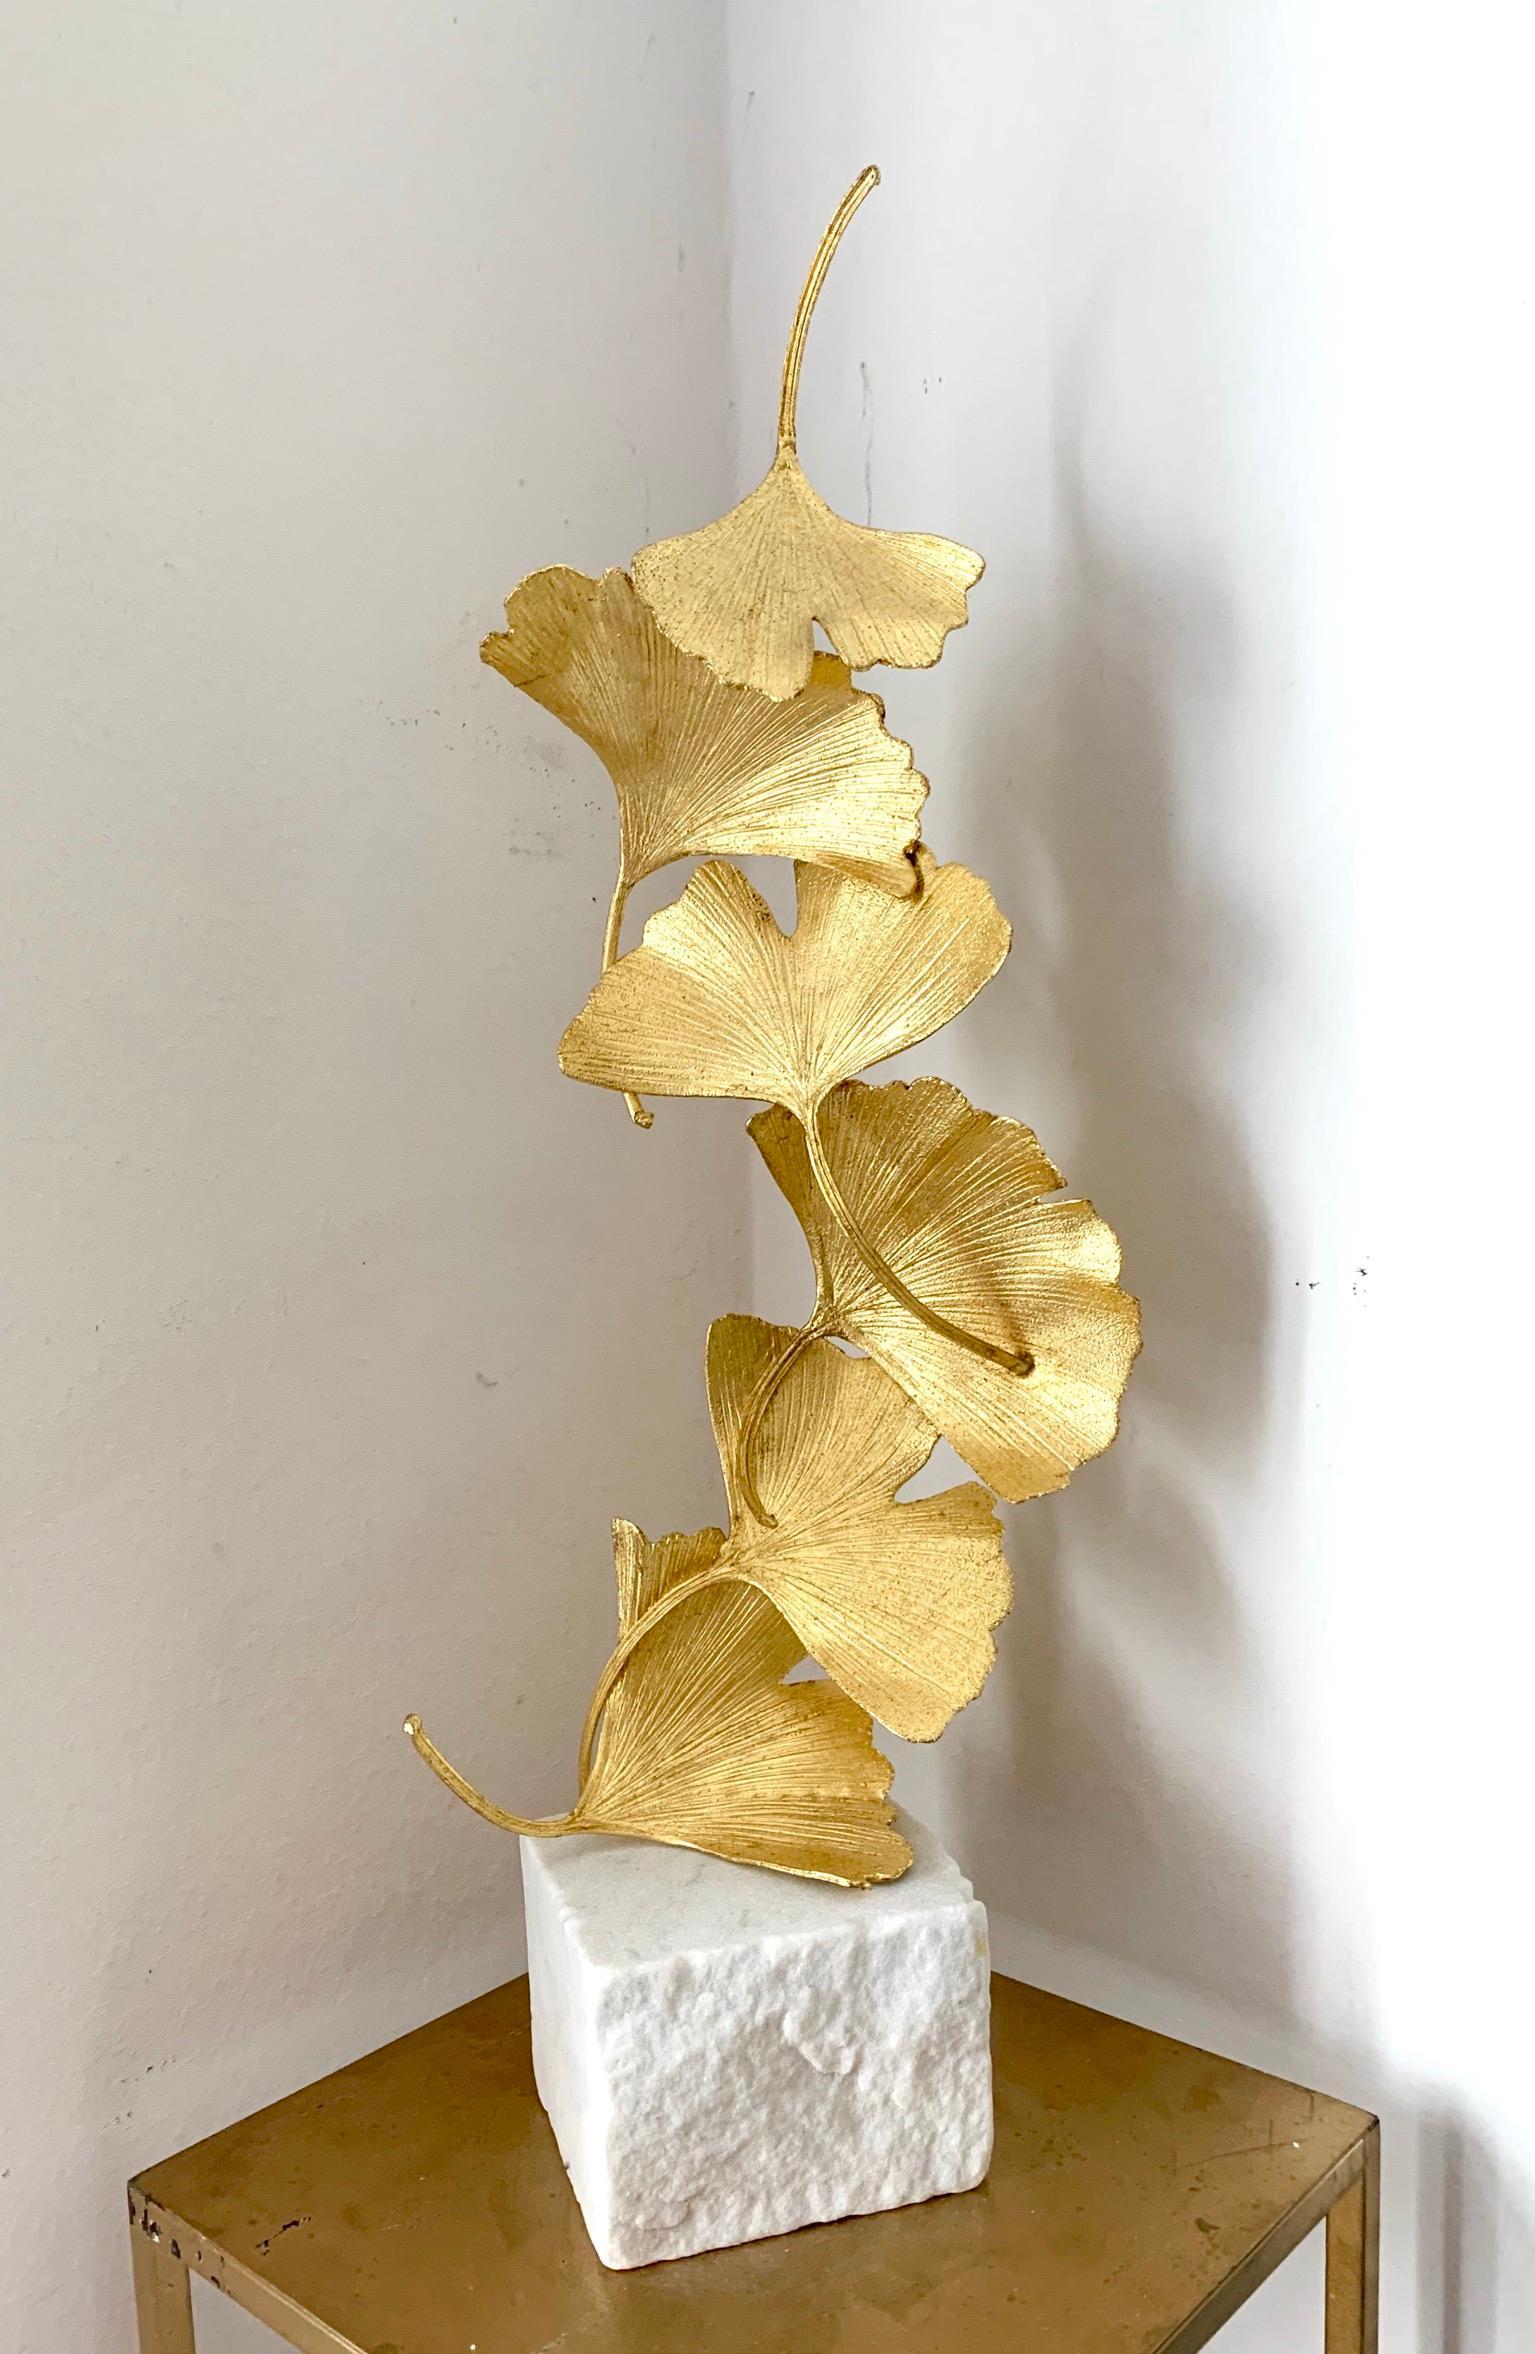 6 Golden Gingko Leaves Kuno Vollet- Cast Brass golden sculpture on white marble